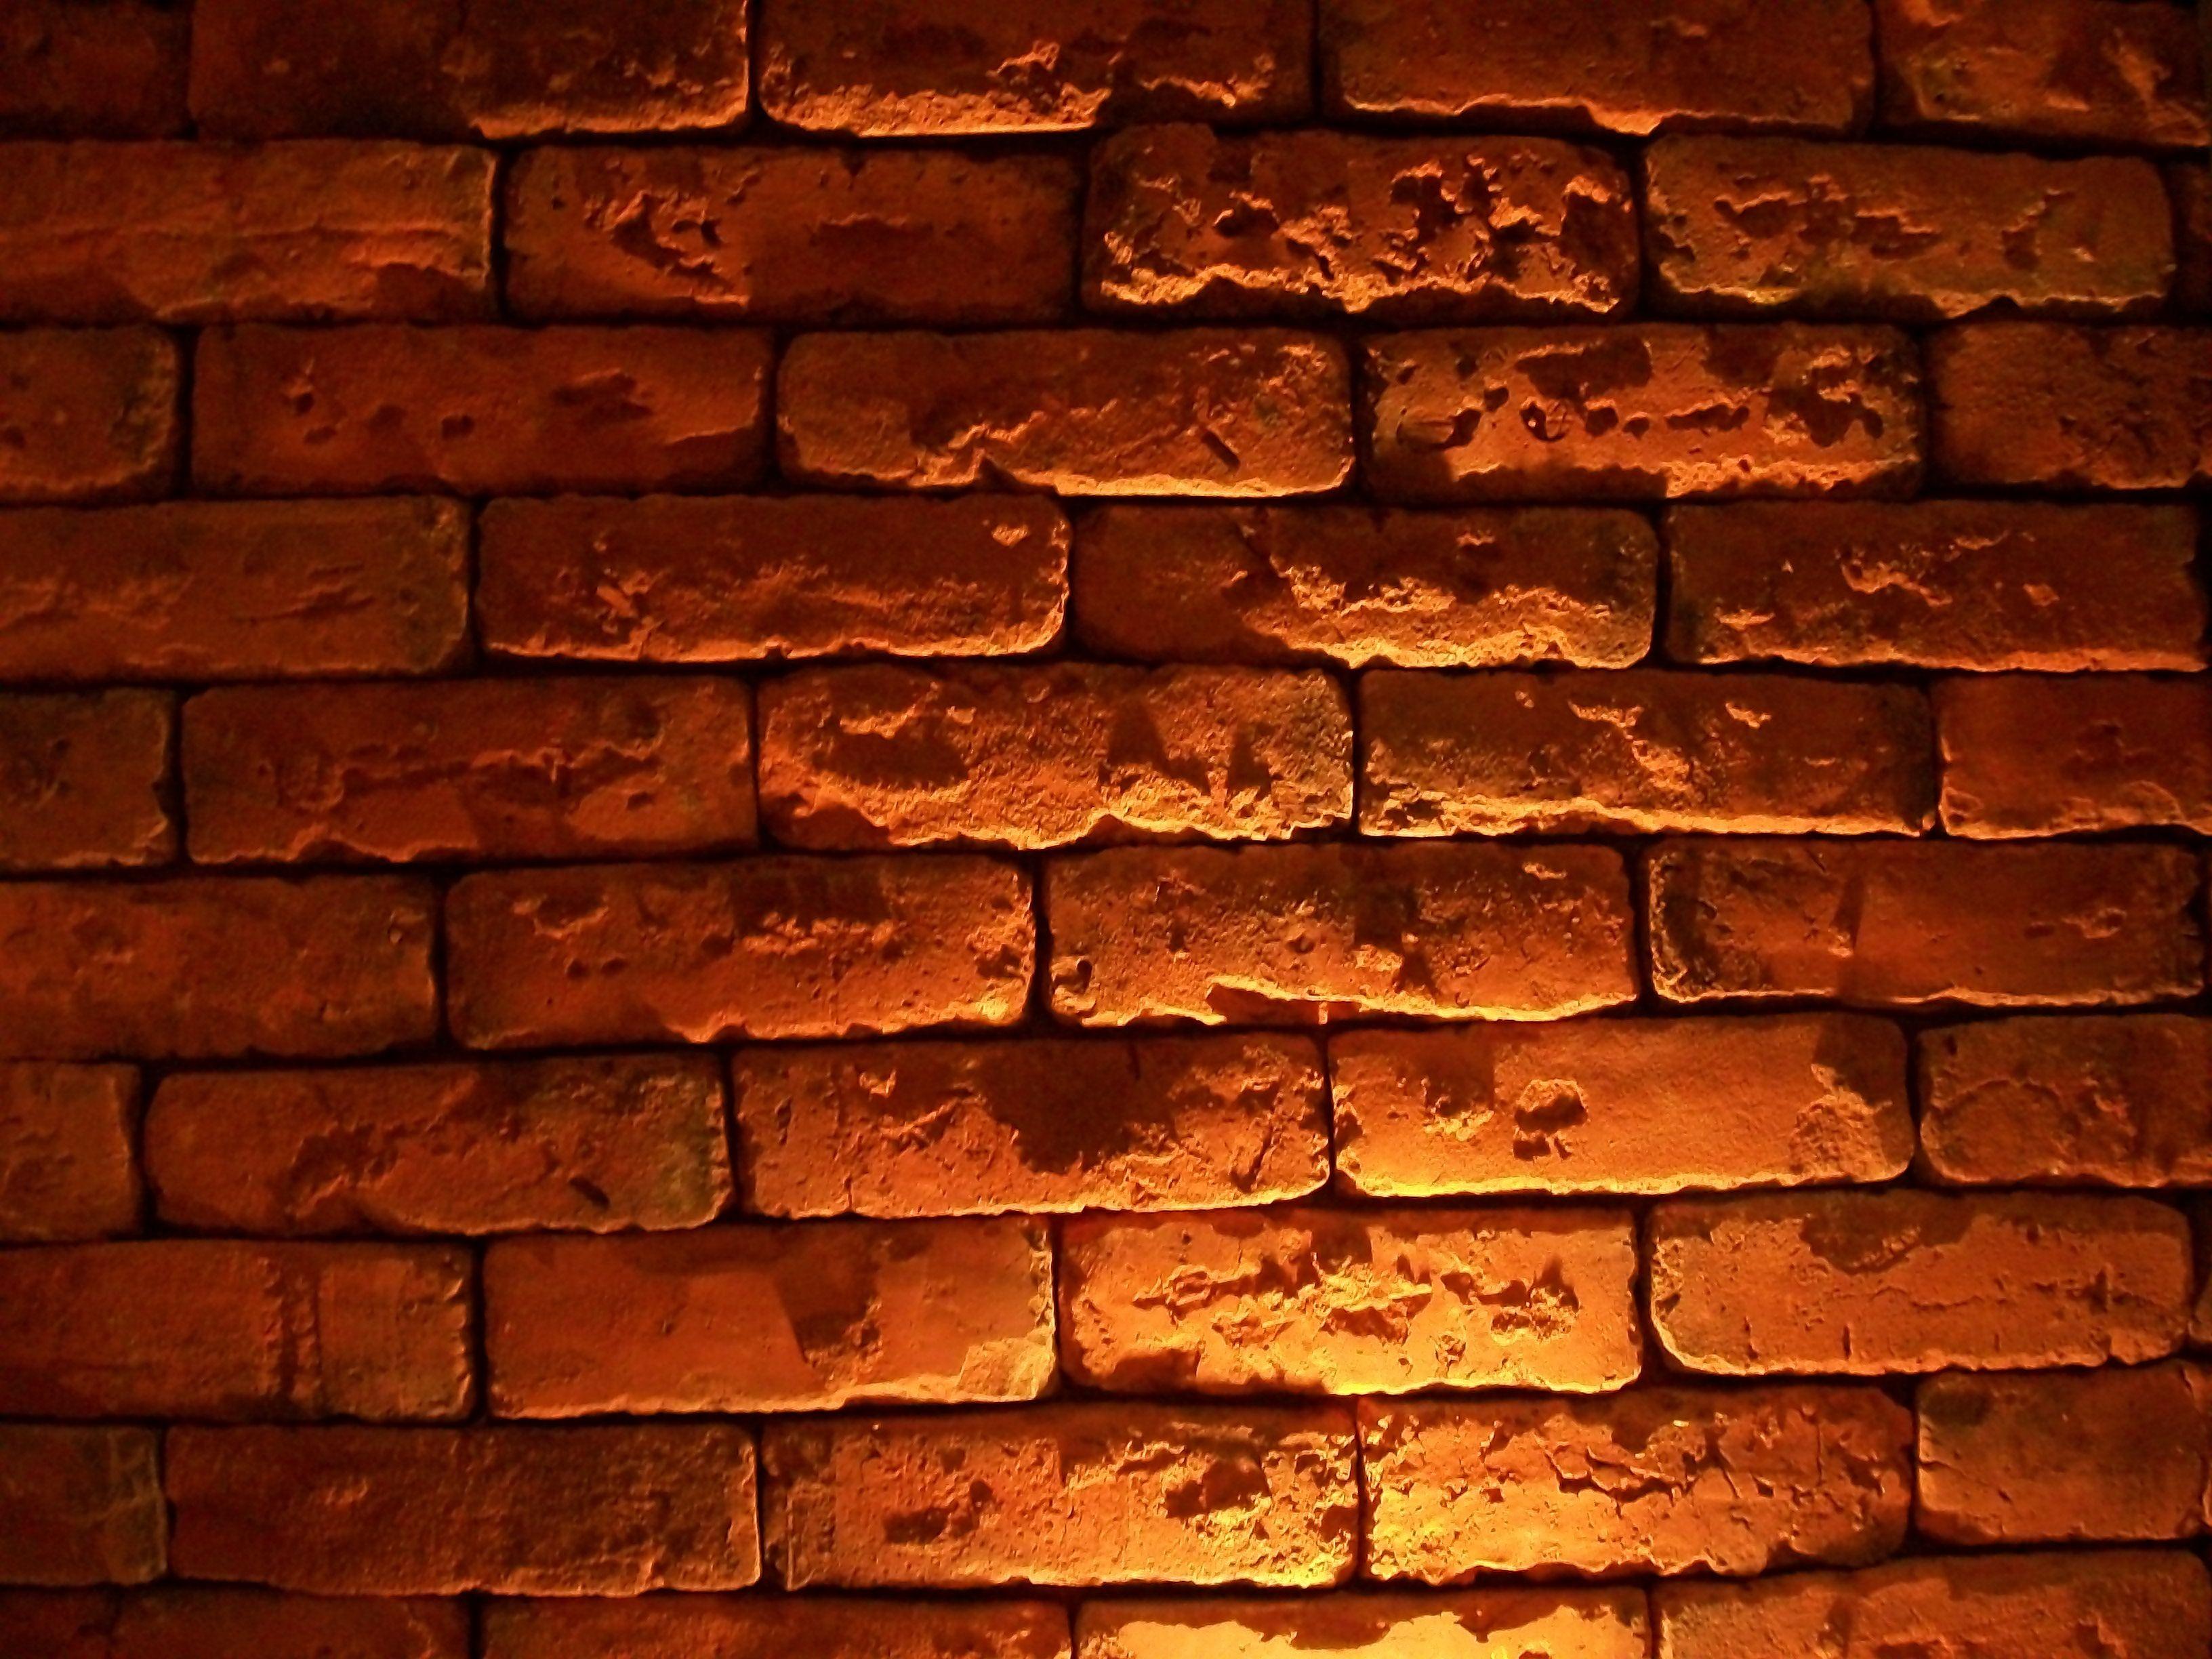 Brick Wallpapers 32 3264 X 2448